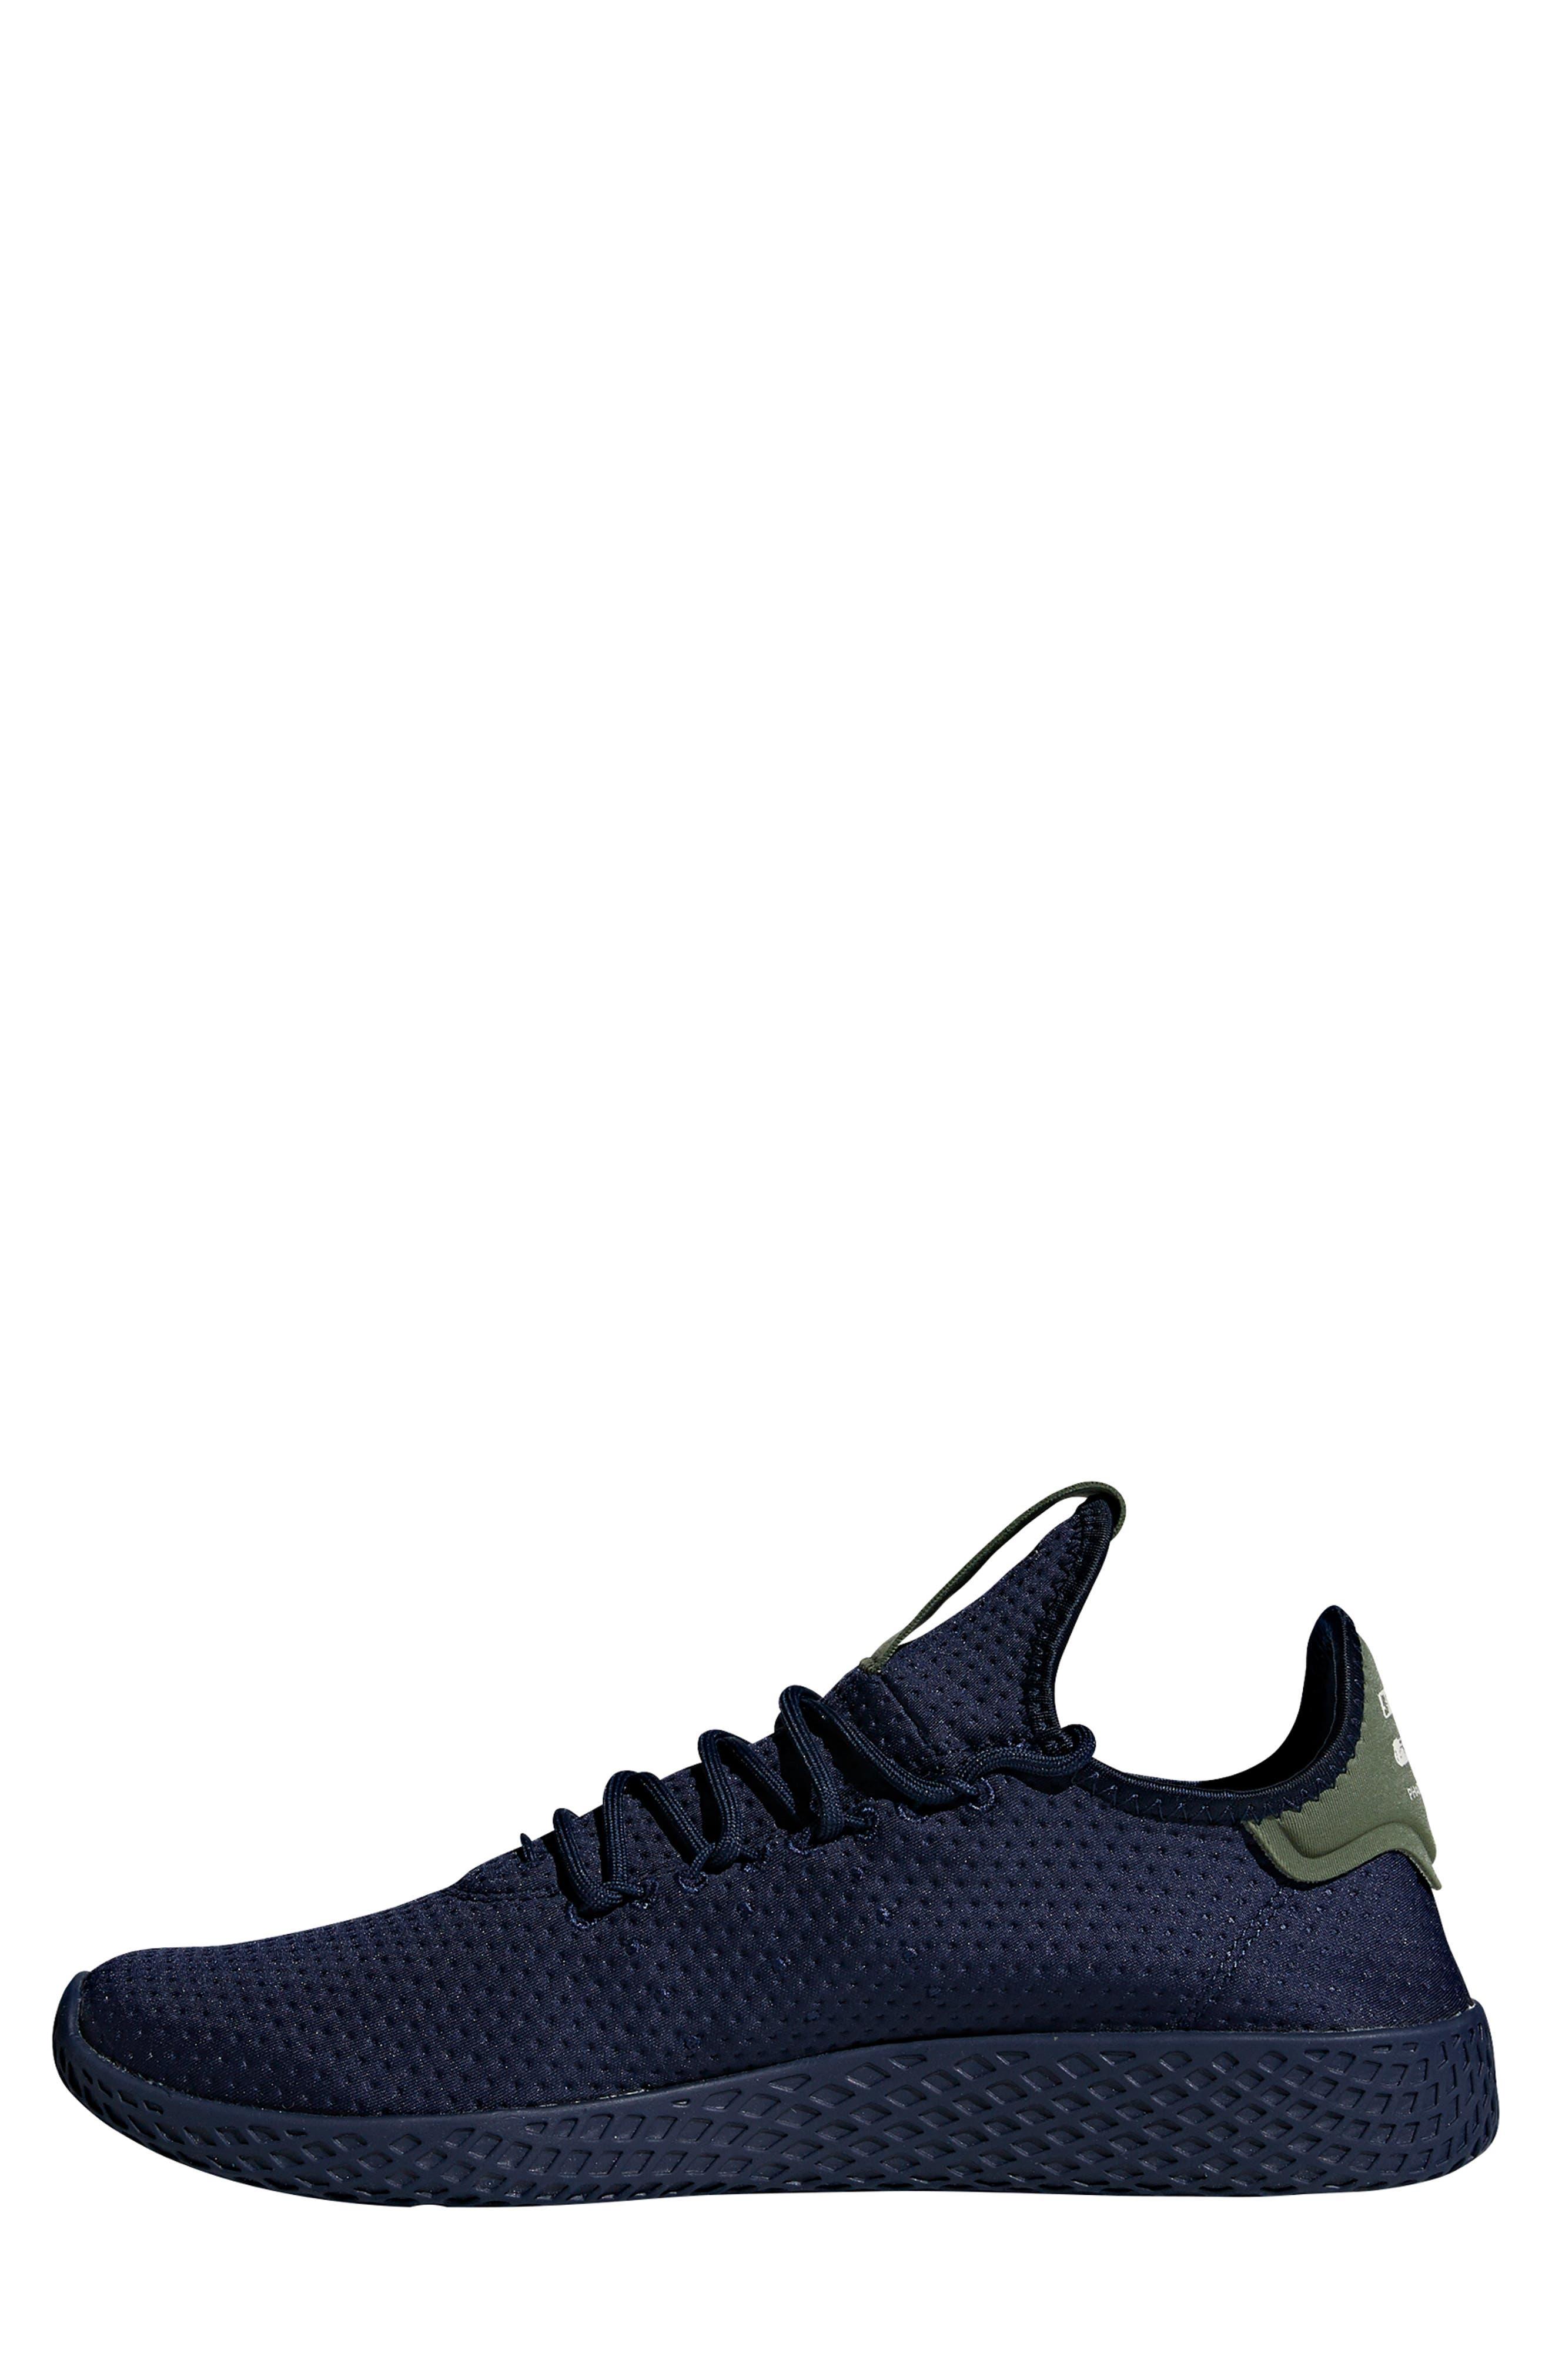 Pharrell Williams Tennis Hu Sneaker,                             Alternate thumbnail 7, color,                             415